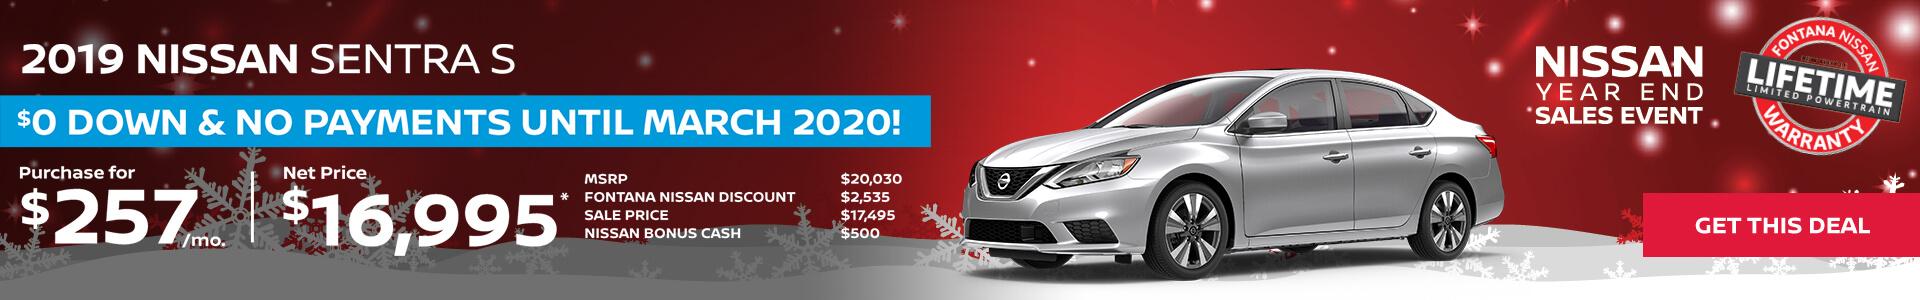 Nissan Sentra $257